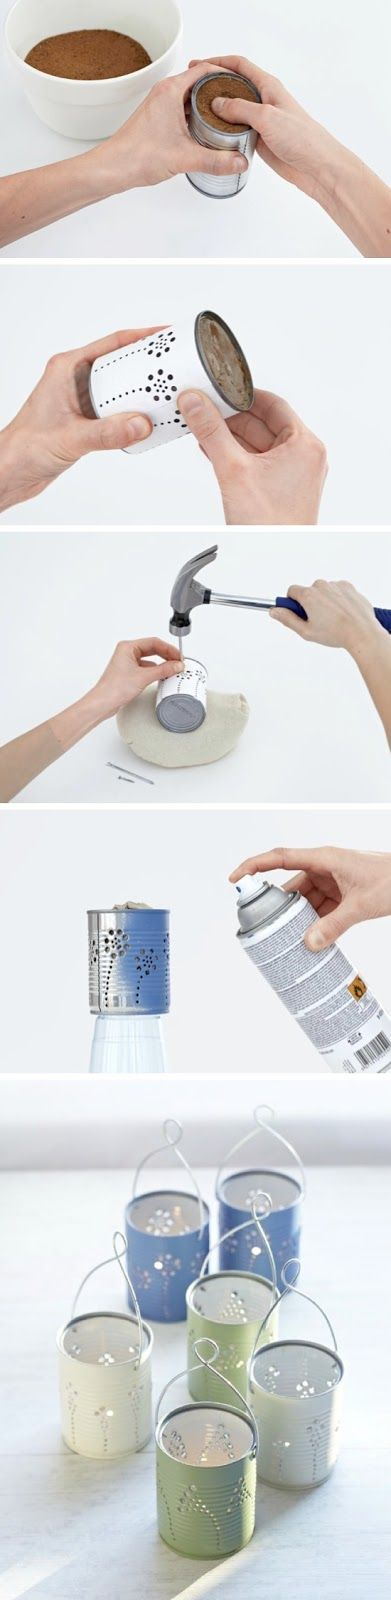 Diy tin can lanterns craft by photo: